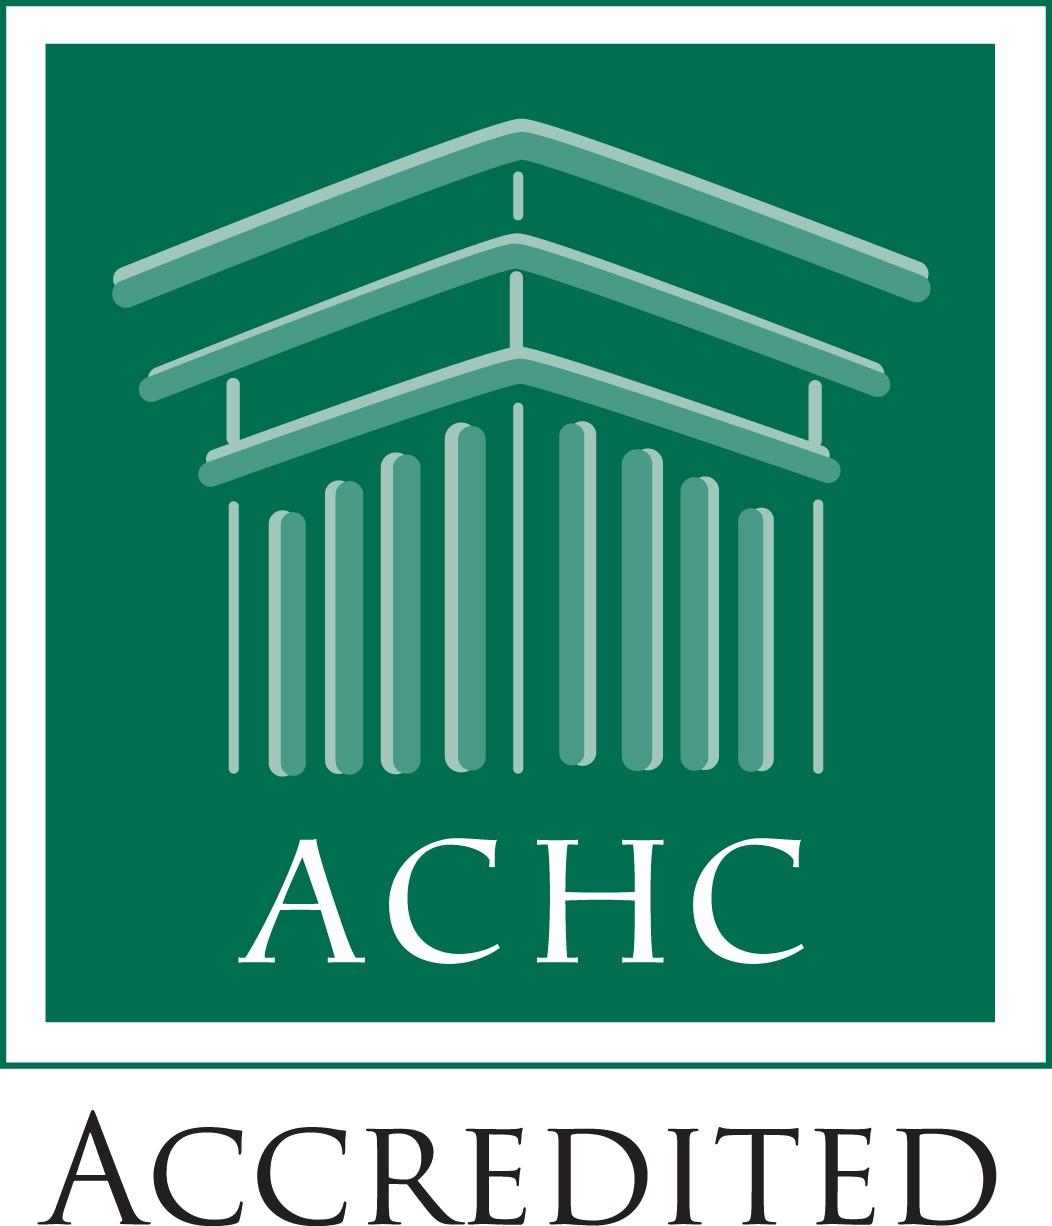 ACHC-Accredited.jpg